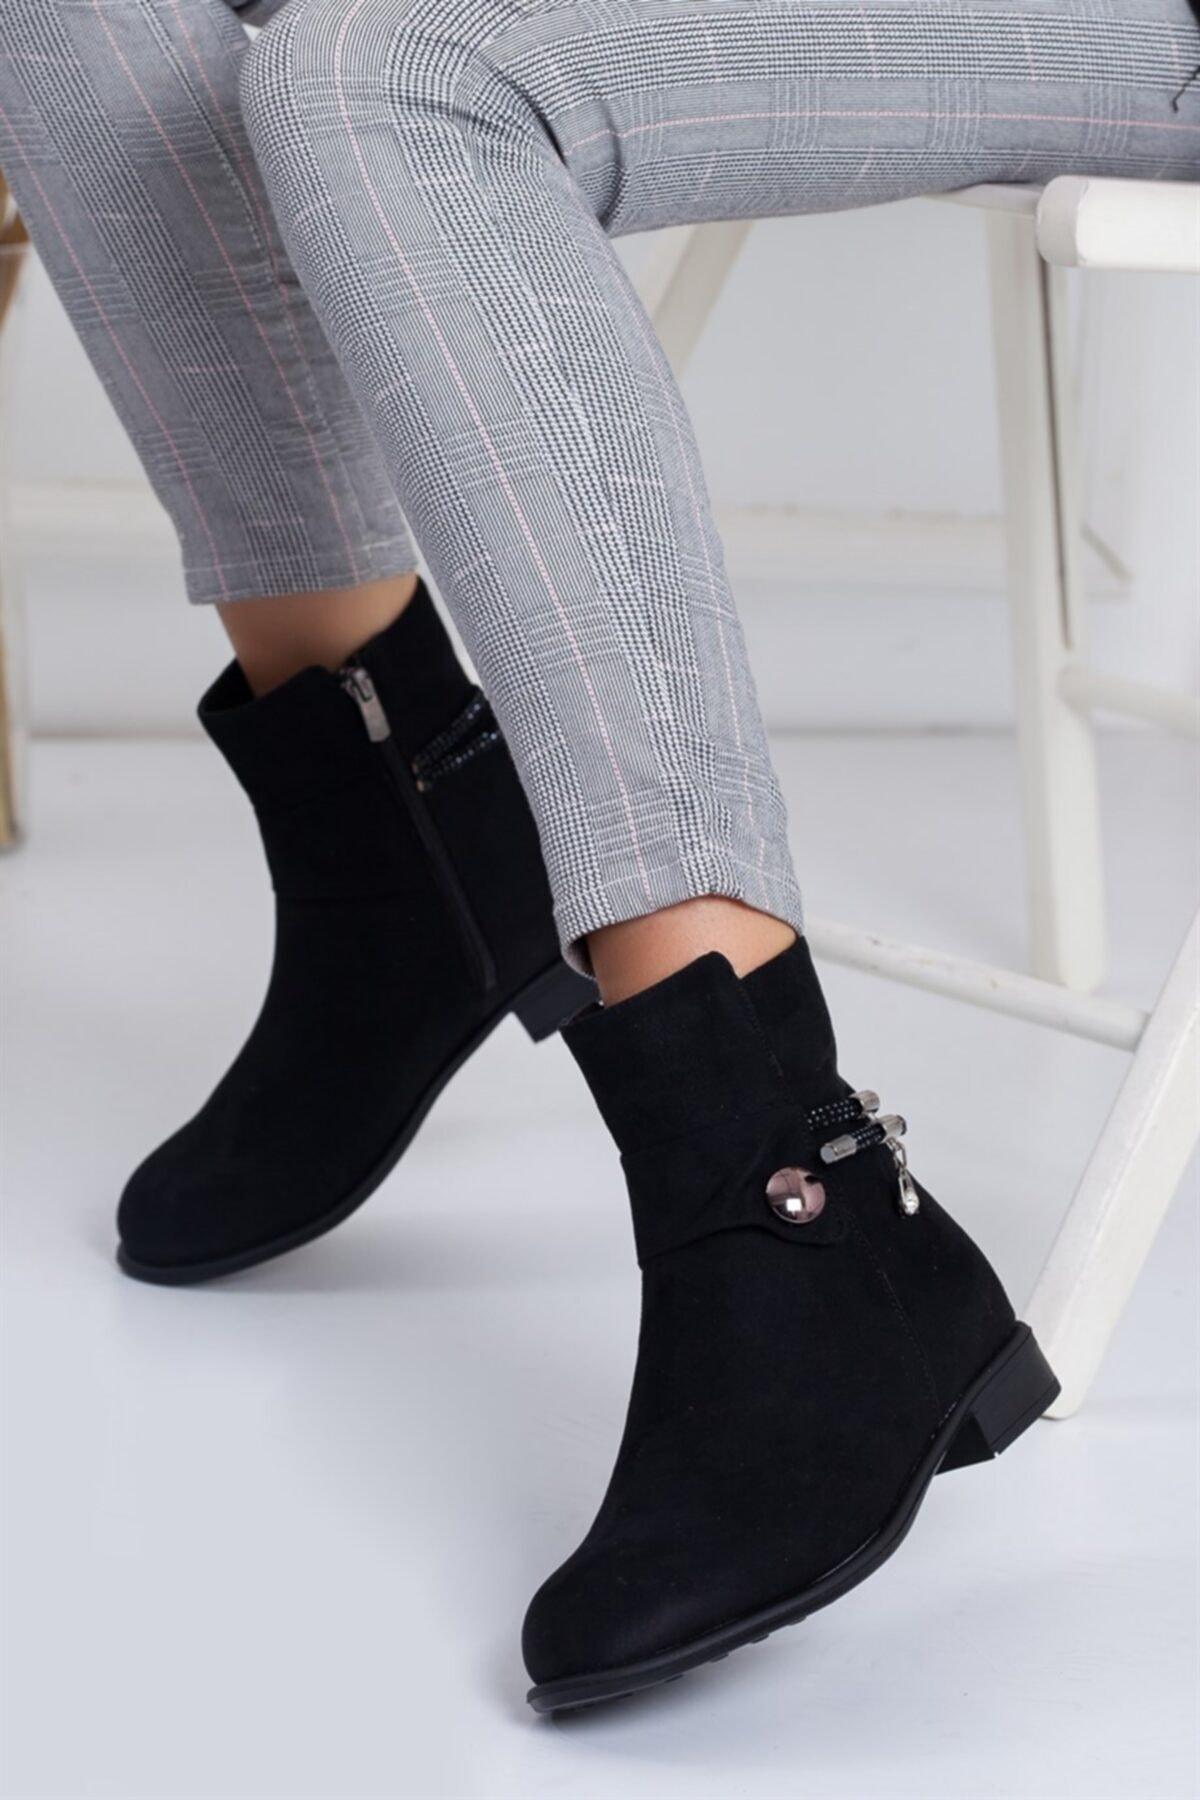 Lovita Shoes Kadın Siyah Bot